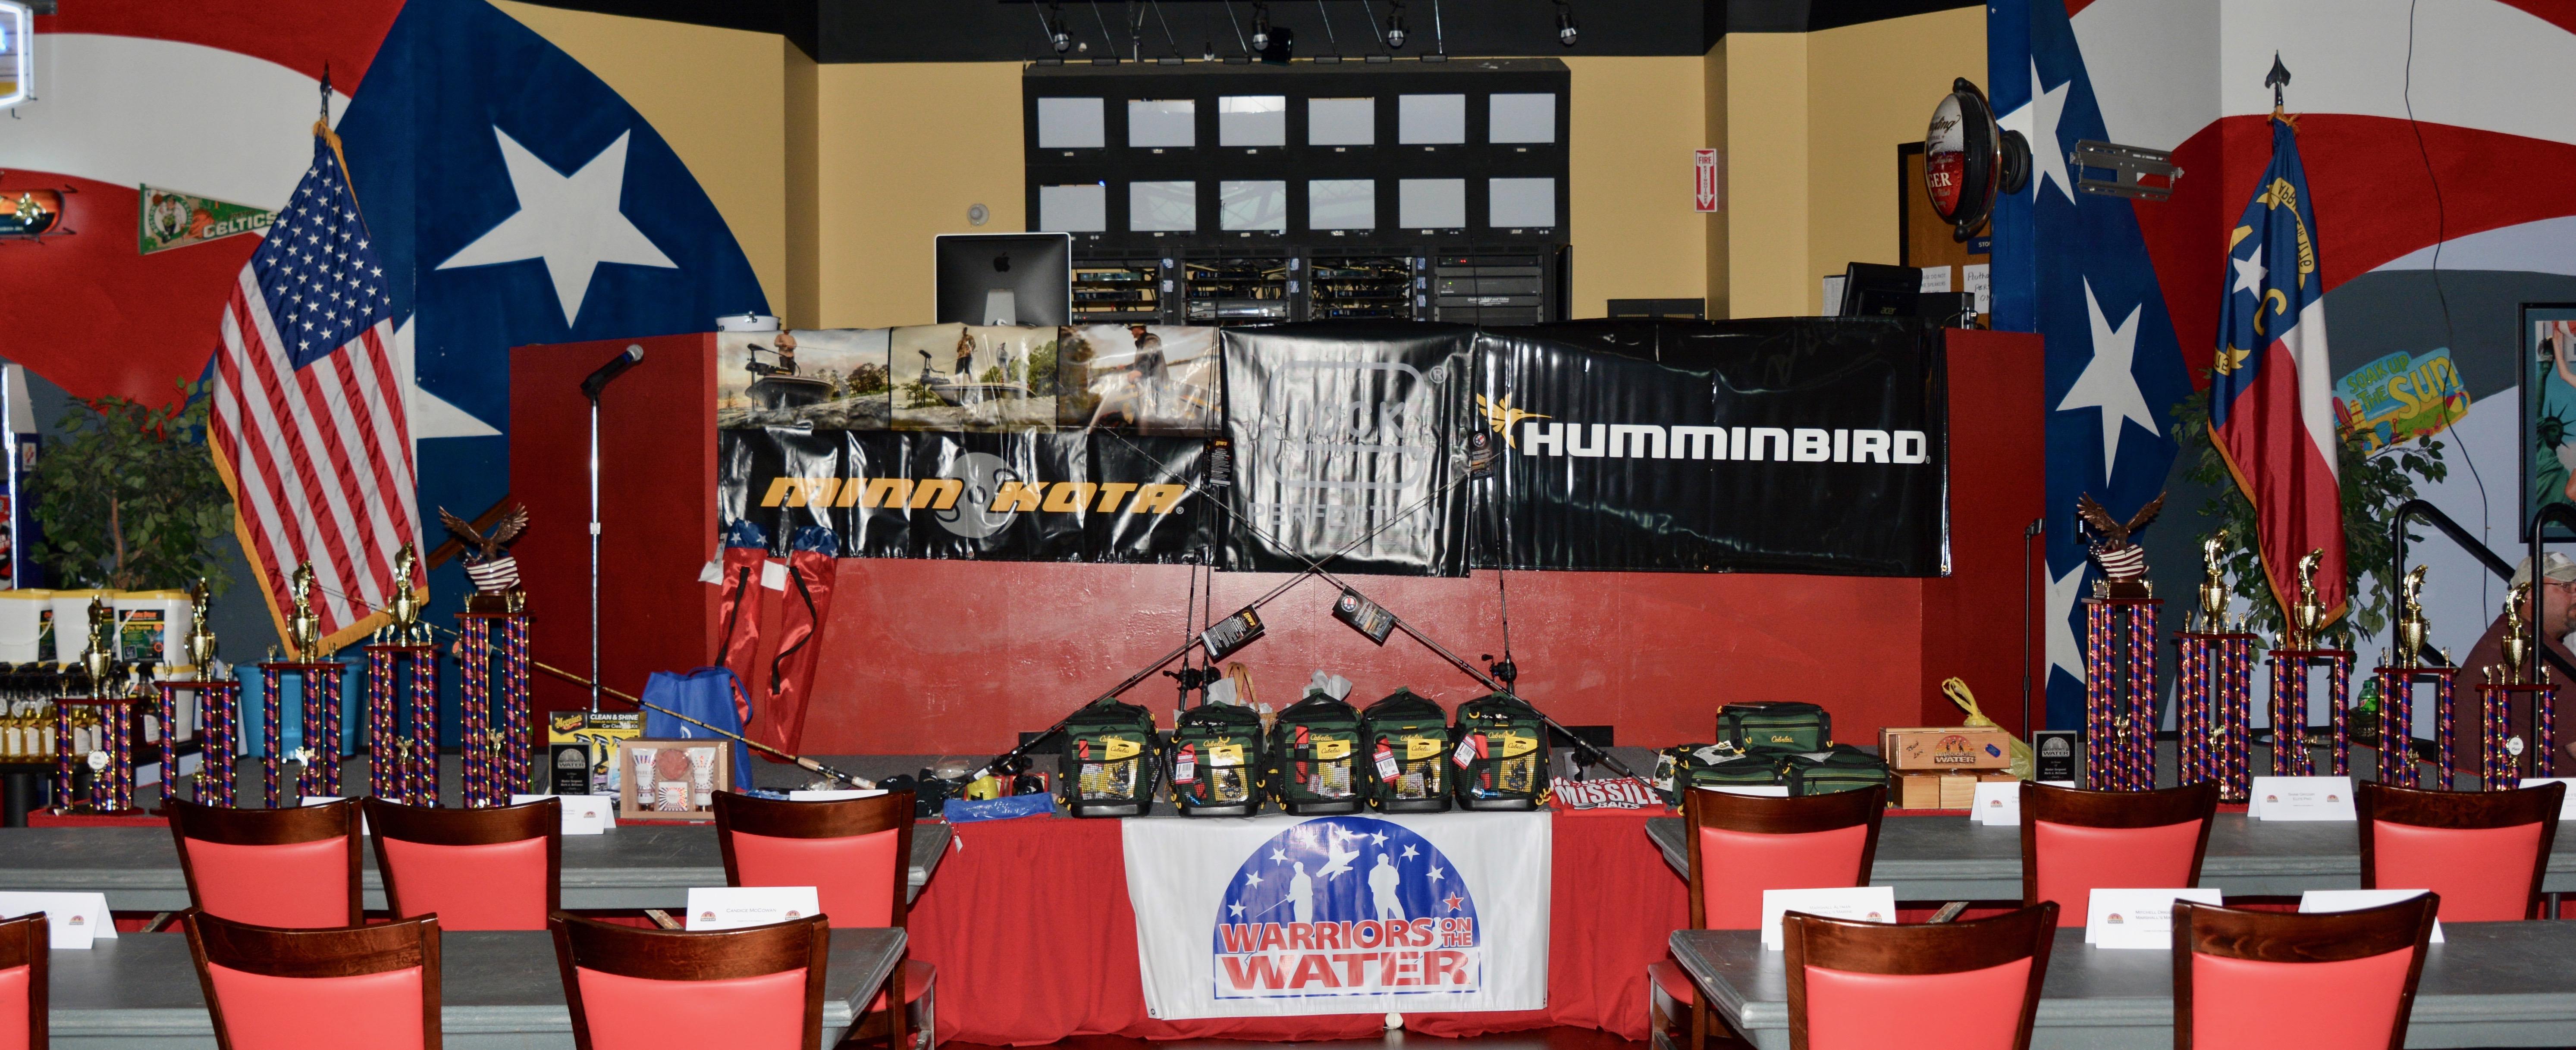 IceBreaker Sports, USA Ft. Bragg, NC